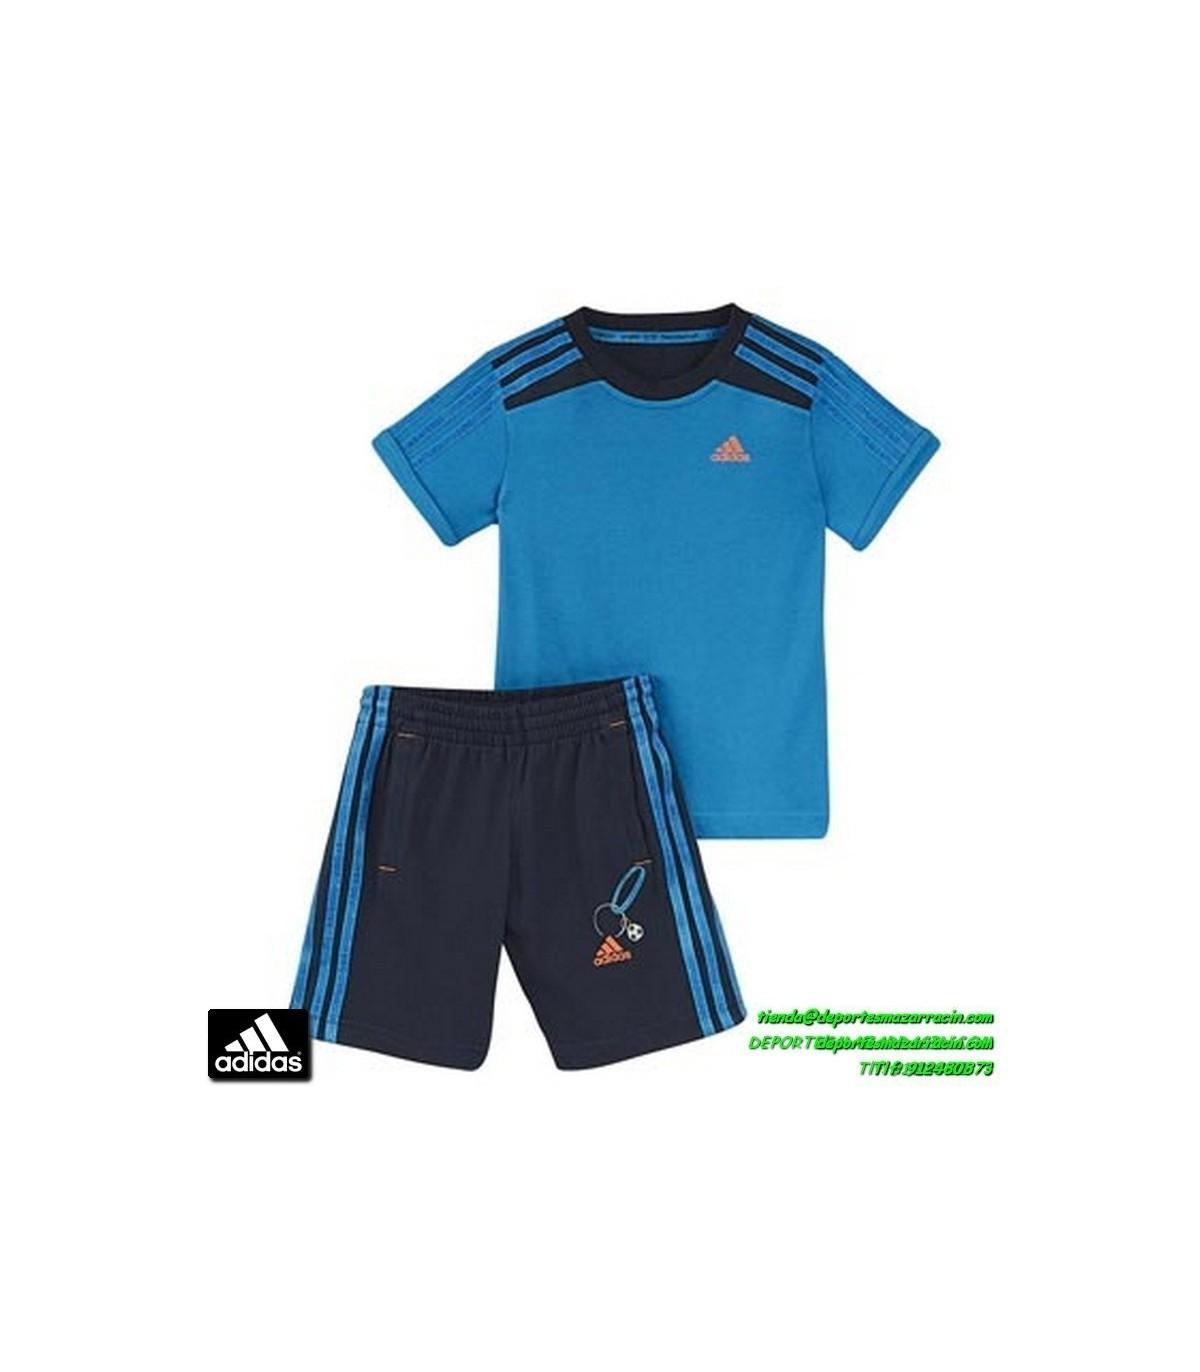 efef9a0bd ADIDAS conjunto niño azul SUMMER SET camiseta mas short